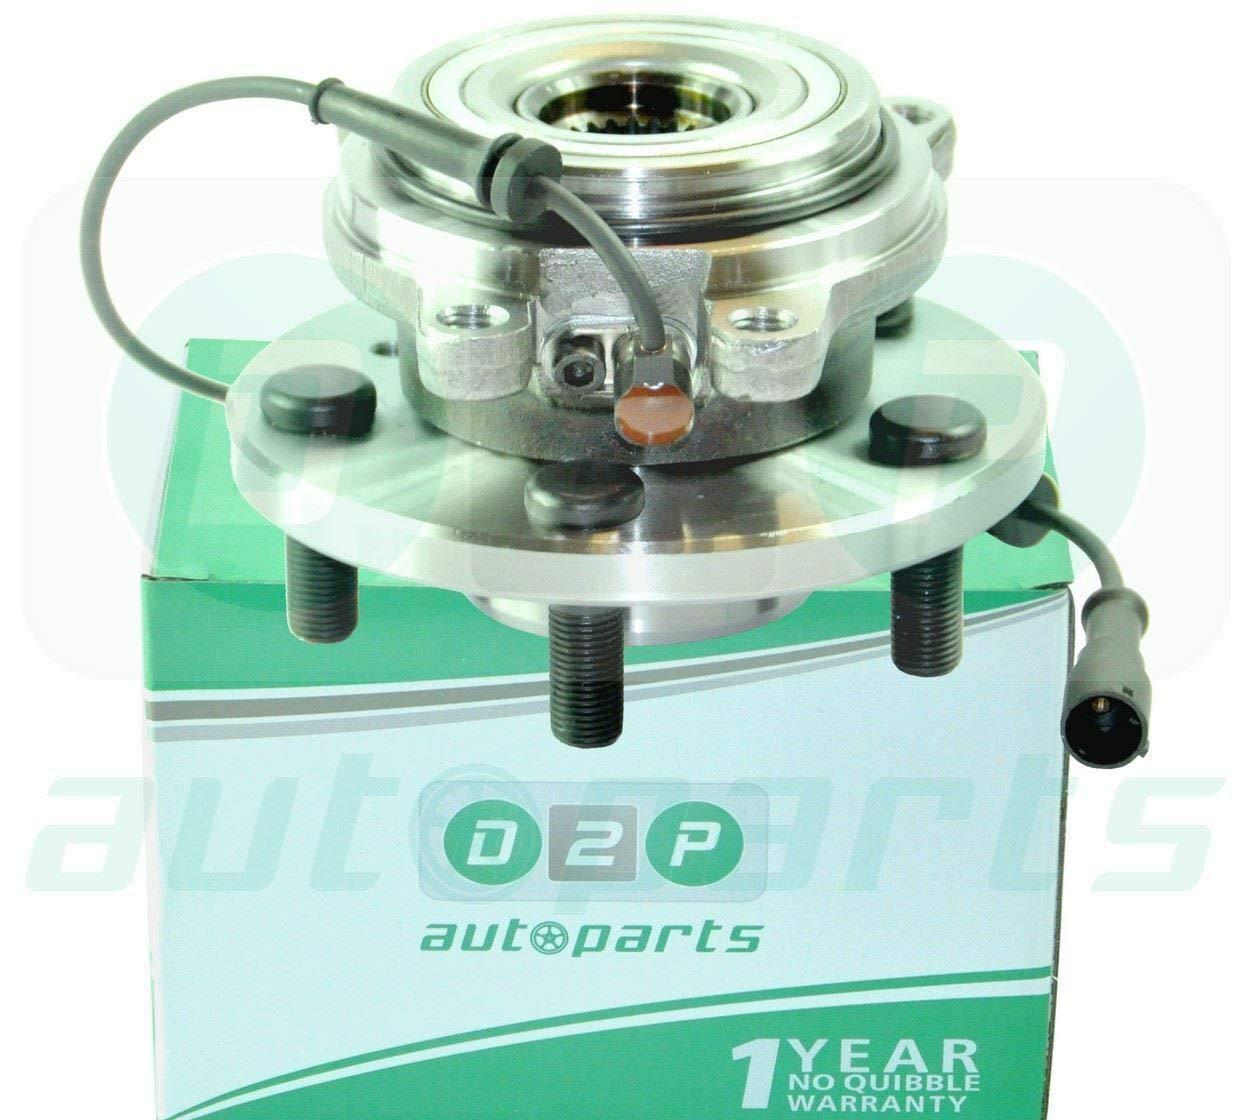 D2P TAY100050, TAD100010, 18TAY100050 Wheel Bearing HUB